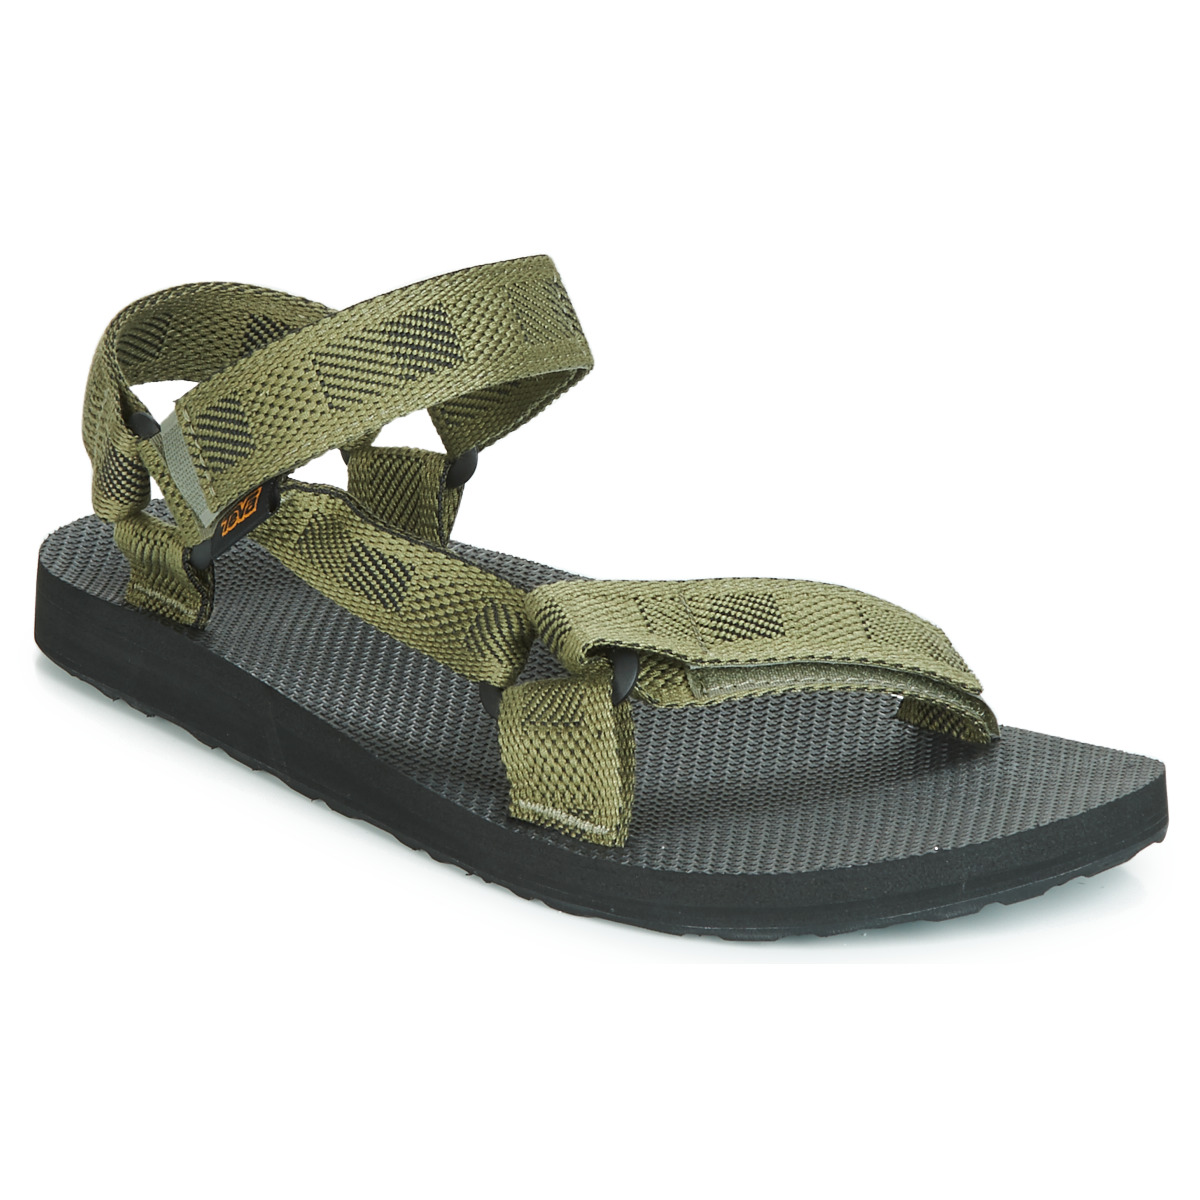 nuovi stili 33c0b b9f17 Teva Sandali & Odprti čevlji ORIGINAL UNIVERSAL Zelena